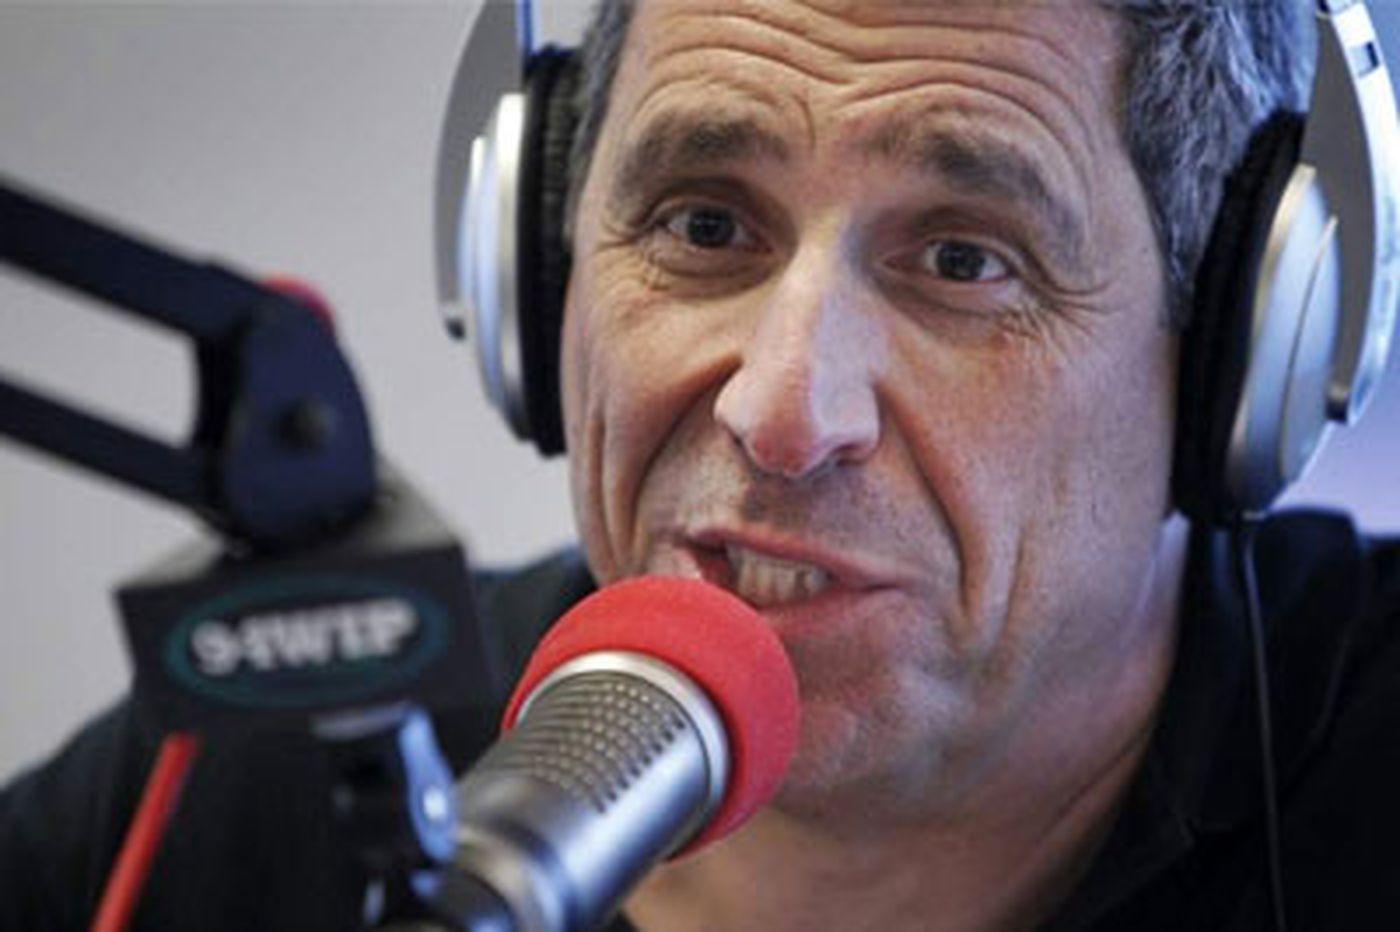 Radio host Angelo Cataldi to undergo diverticulitis surgery